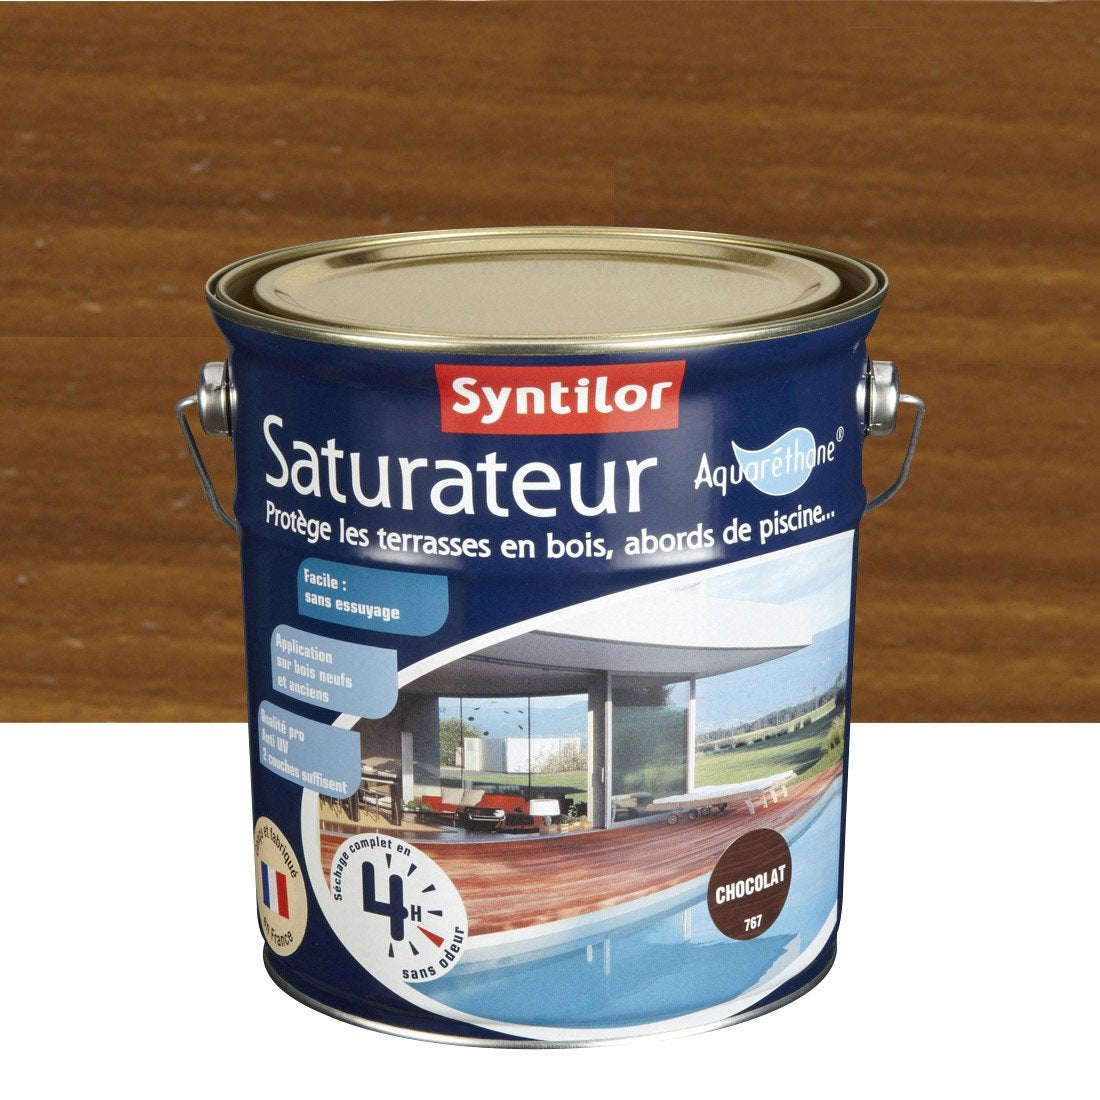 saturateur syntilor aqua 2 5 l incolore leroy merlin. Black Bedroom Furniture Sets. Home Design Ideas